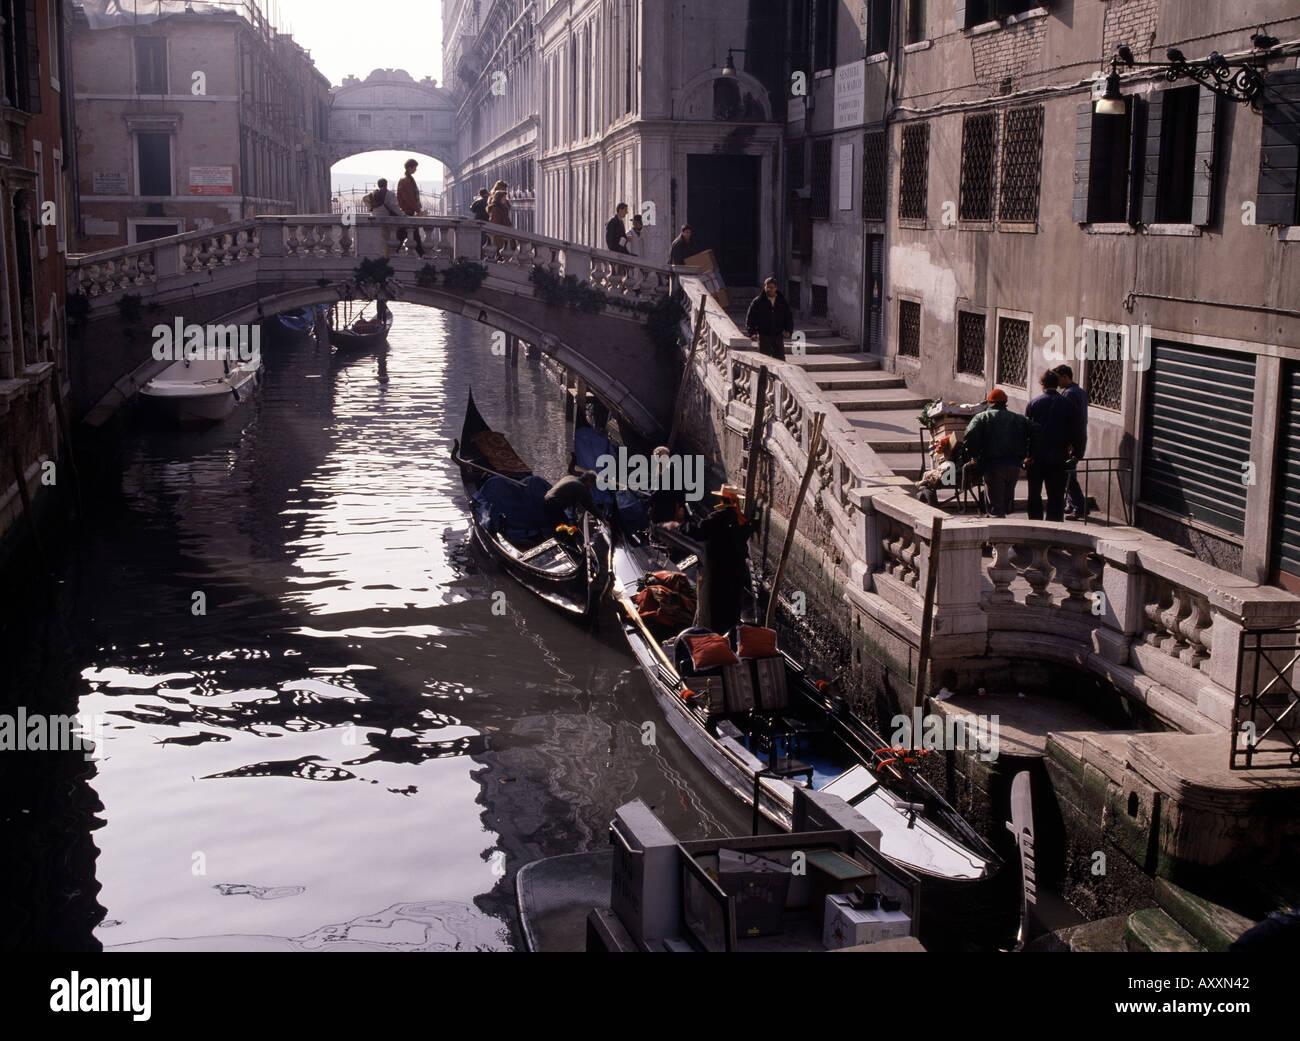 Venedig, Seufzerbrücke, Kanal - Stock Image